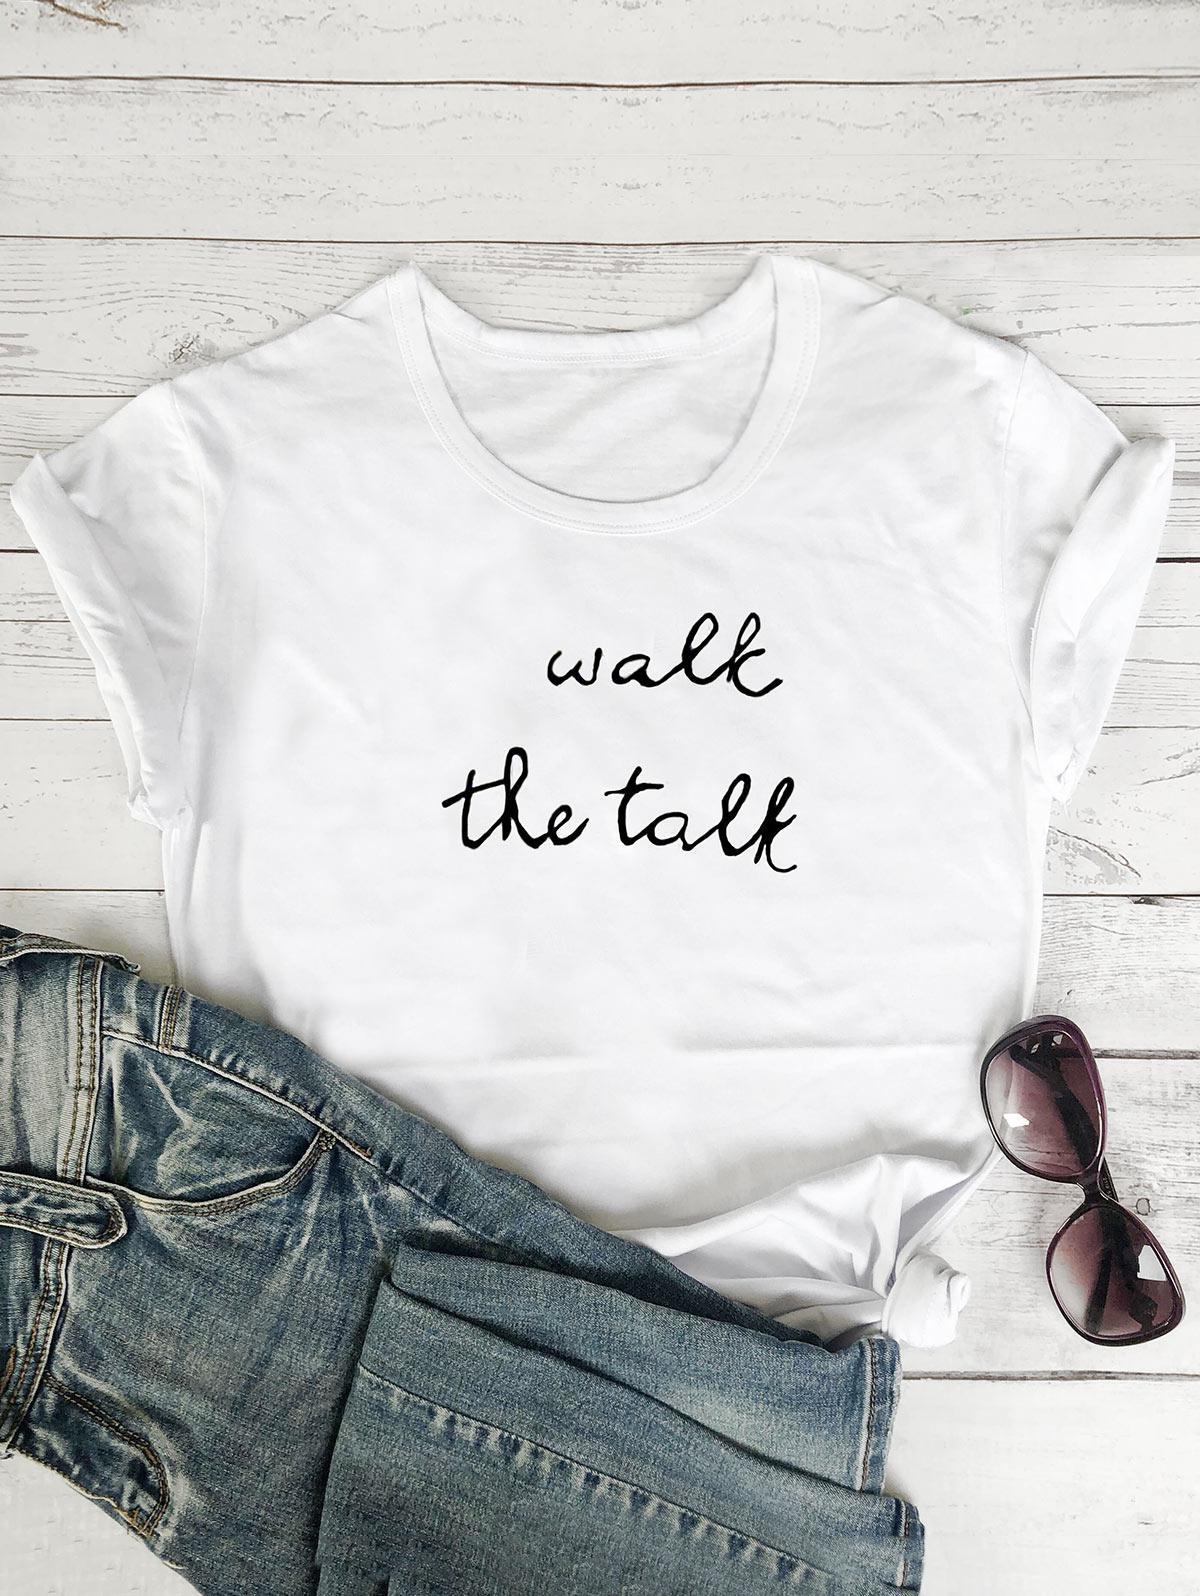 Walk The Talk Graphic Short Sleeve Tee